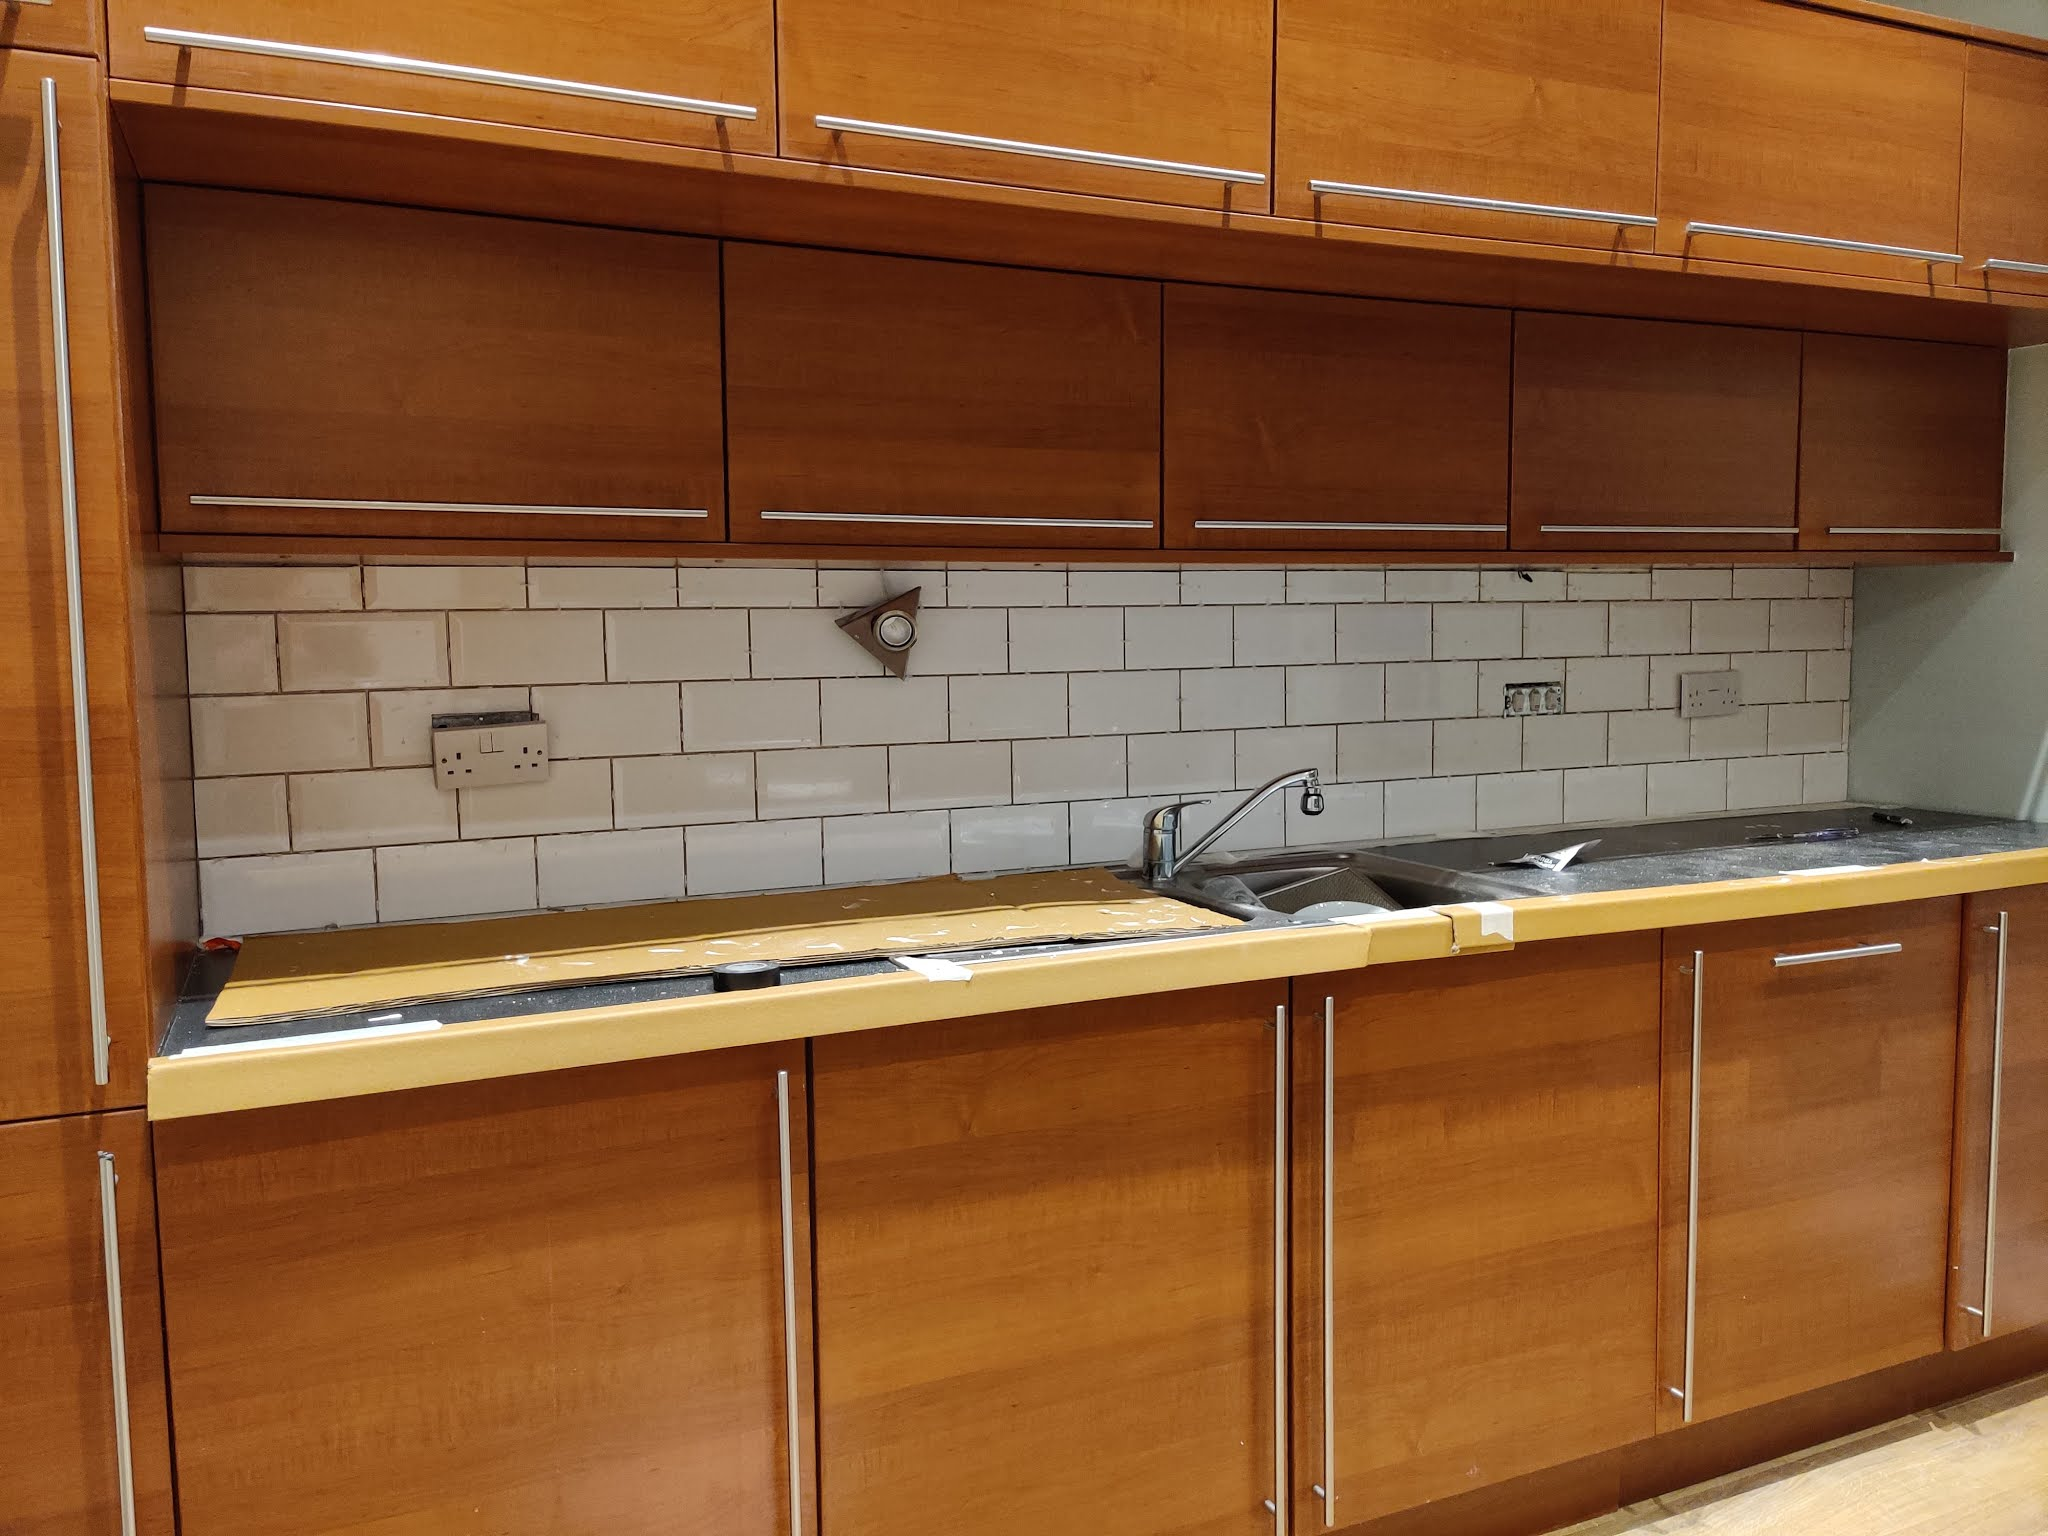 Tiling the Kitchen Splashback - DIY Subway Tiles liquid grain